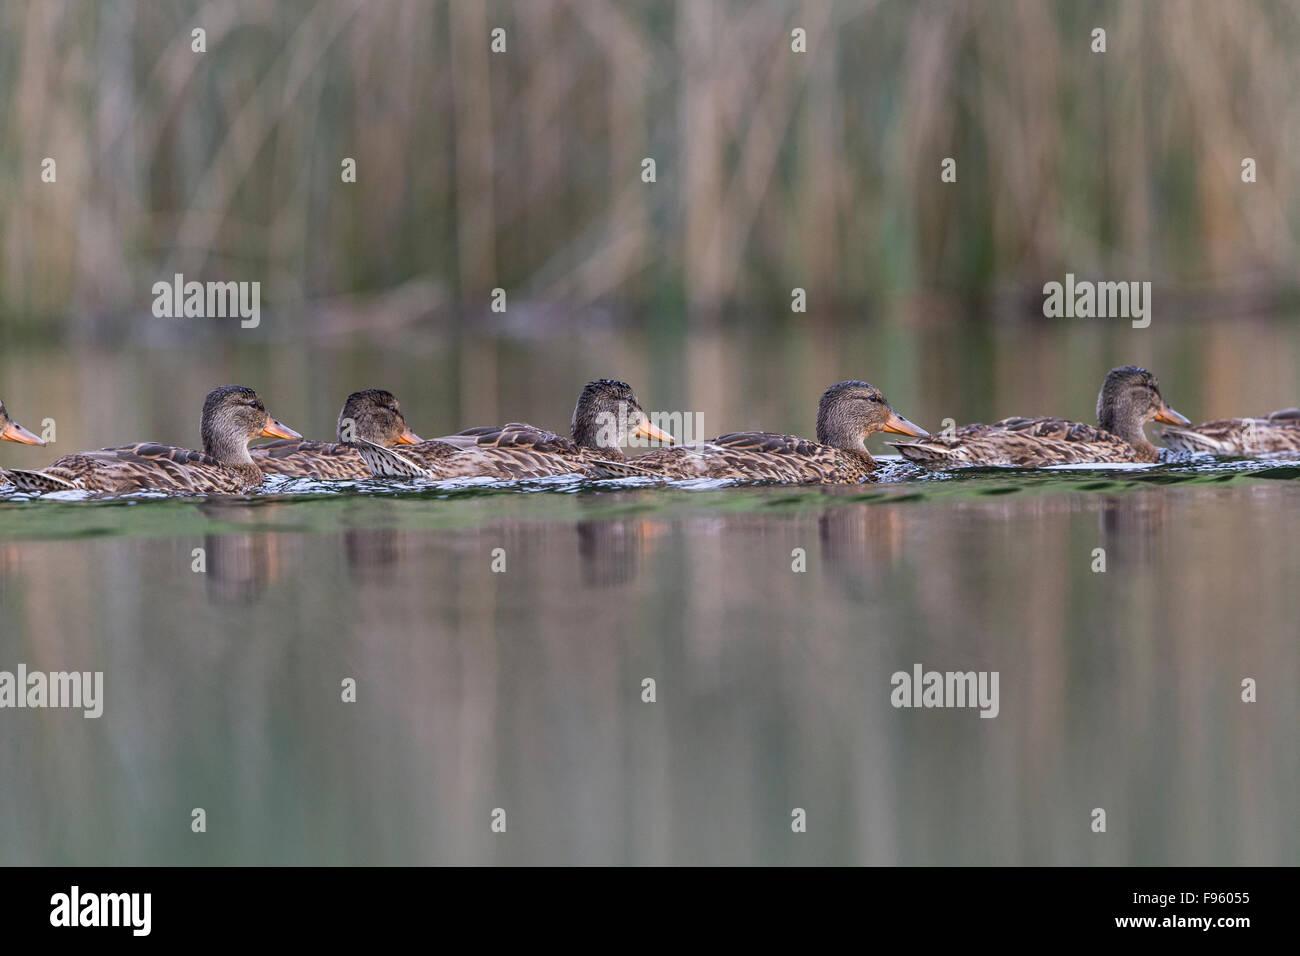 Mallard (Anas platyrhynchos), females, Kamloops, British Columbia. - Stock Image